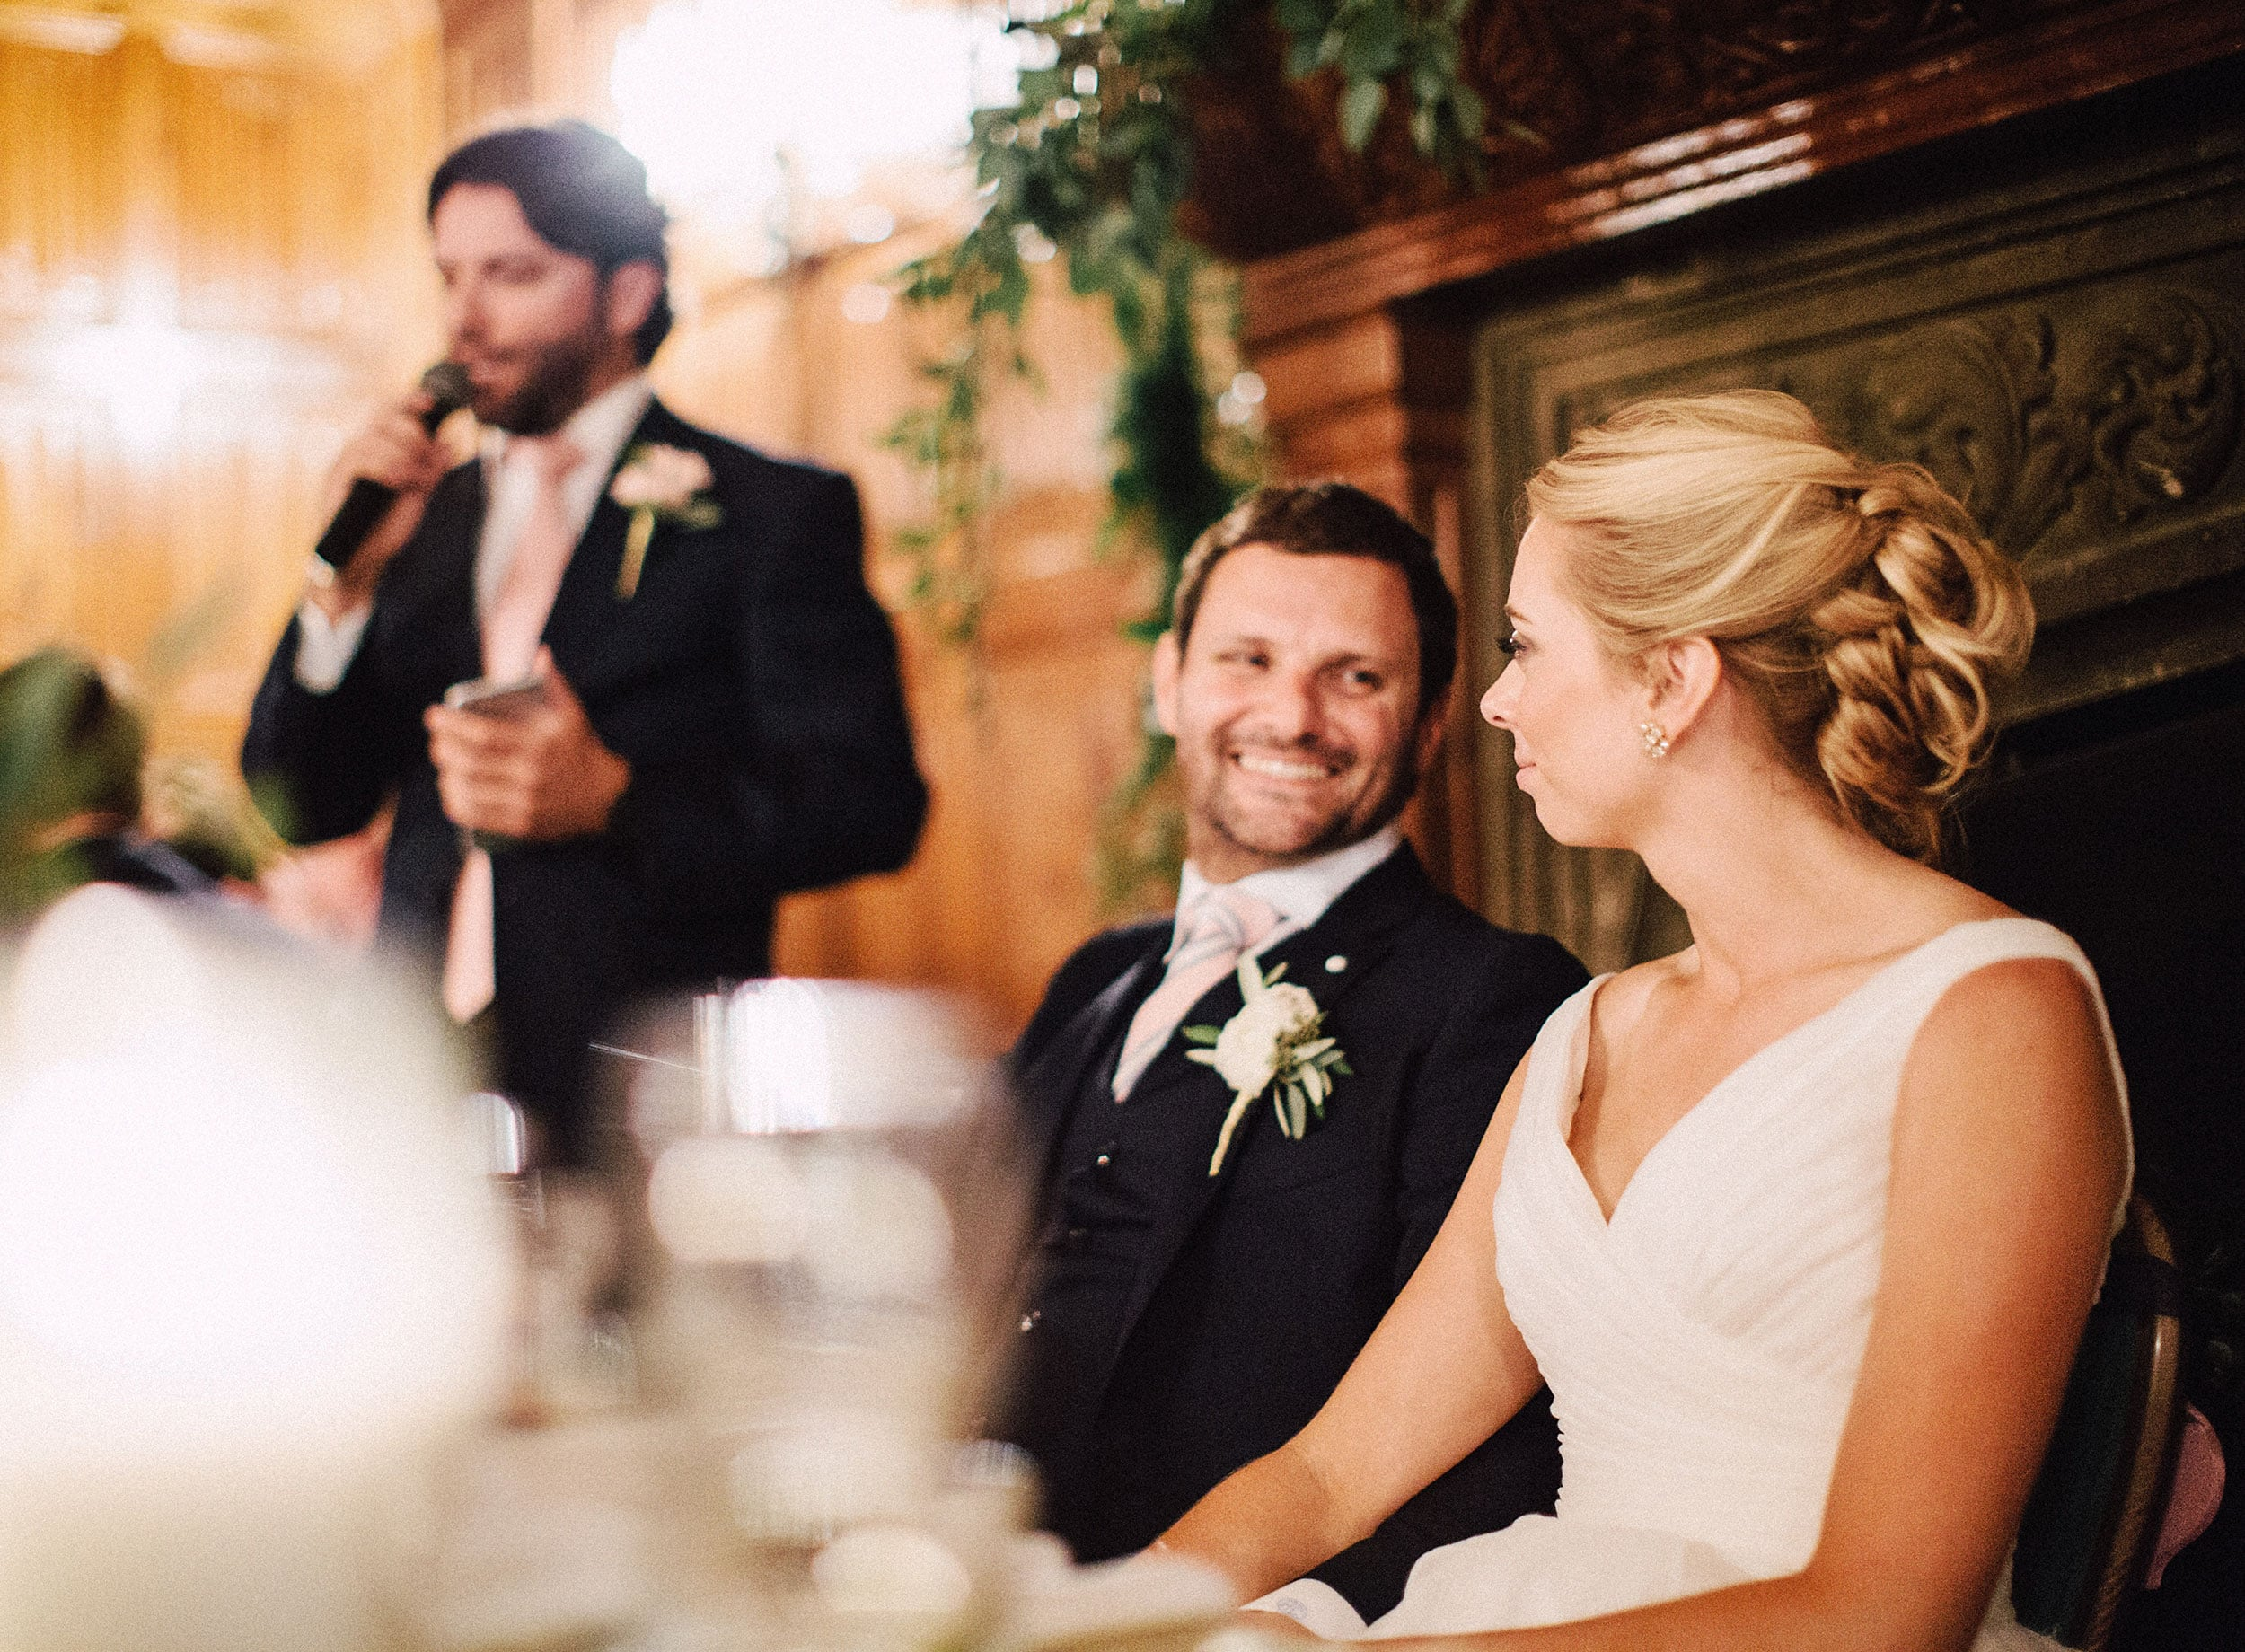 spindletop-lexington-wedding-photographer-035.JPG